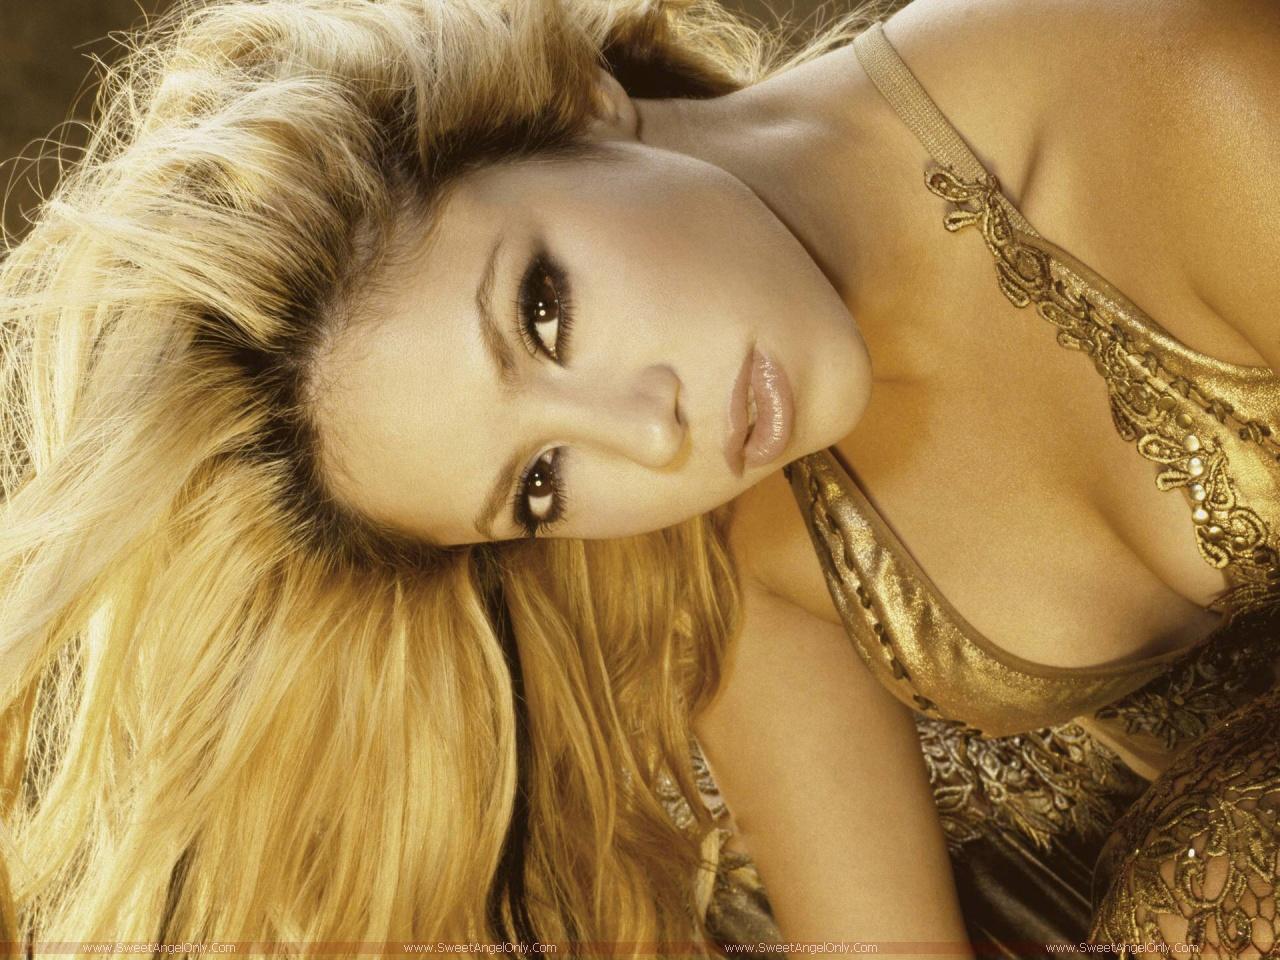 http://1.bp.blogspot.com/-xUcyCbo07iE/TimNHSMgTvI/AAAAAAAAHm4/SXSTGNcnBHQ/s1600/Shakira_full_wide_wallpaper.jpg